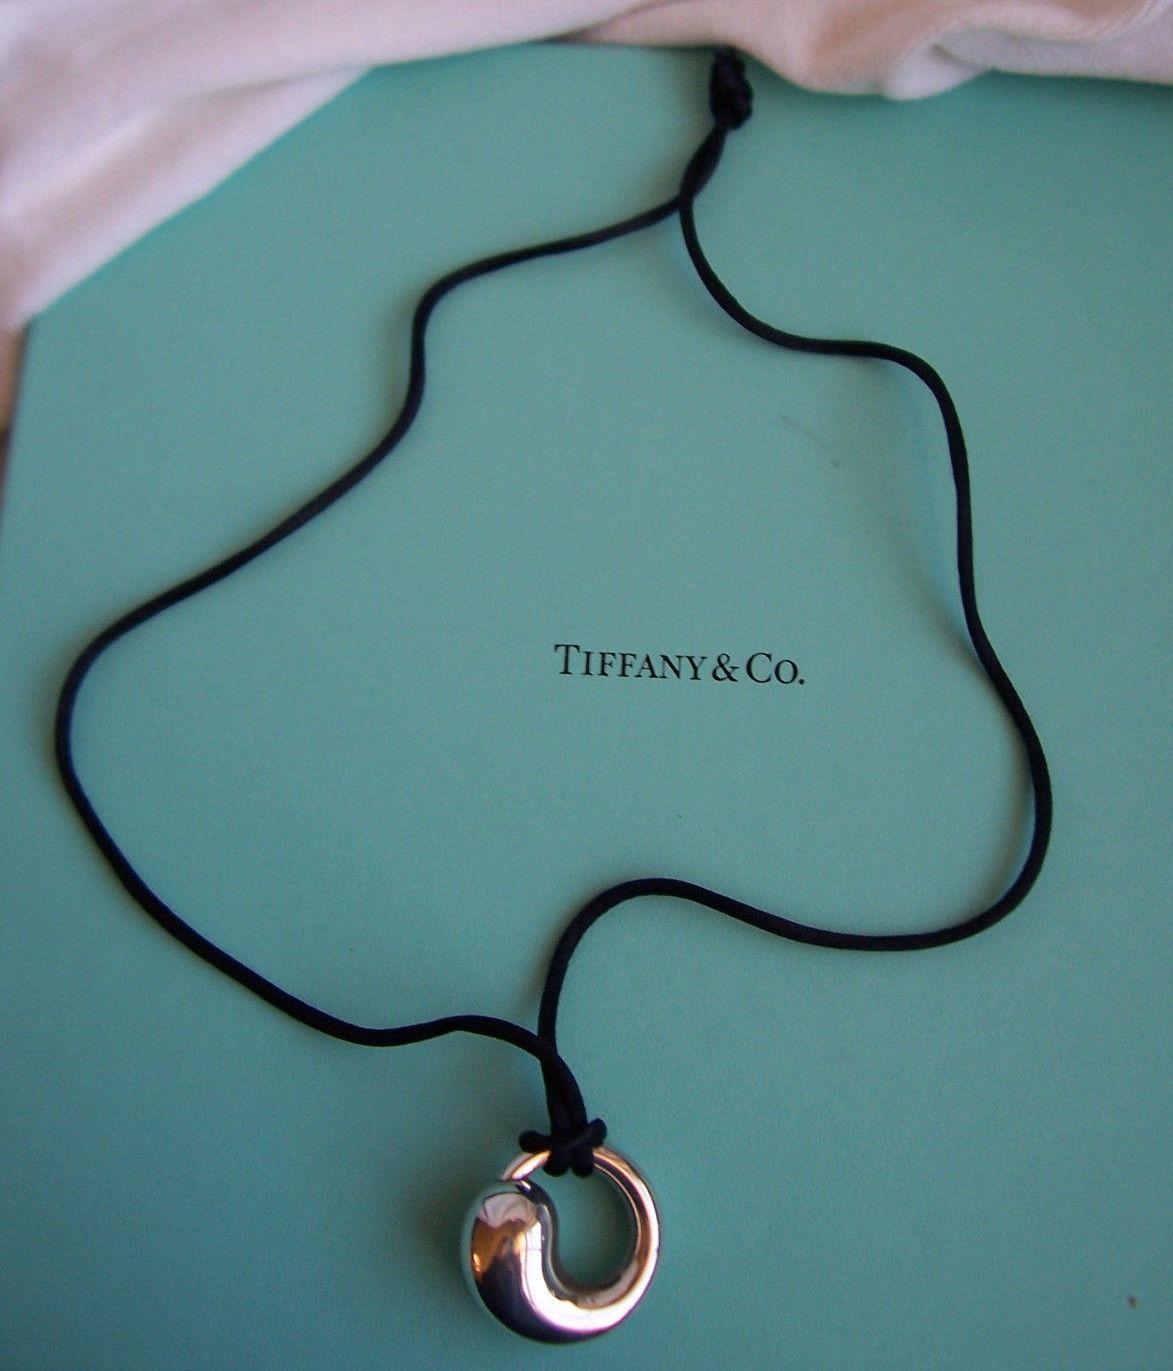 Tiffany co elsa peretti large sterling and 25 similar items 57 57 tiffany co elsa peretti large sterling silver eternal circle pendant aloadofball Images